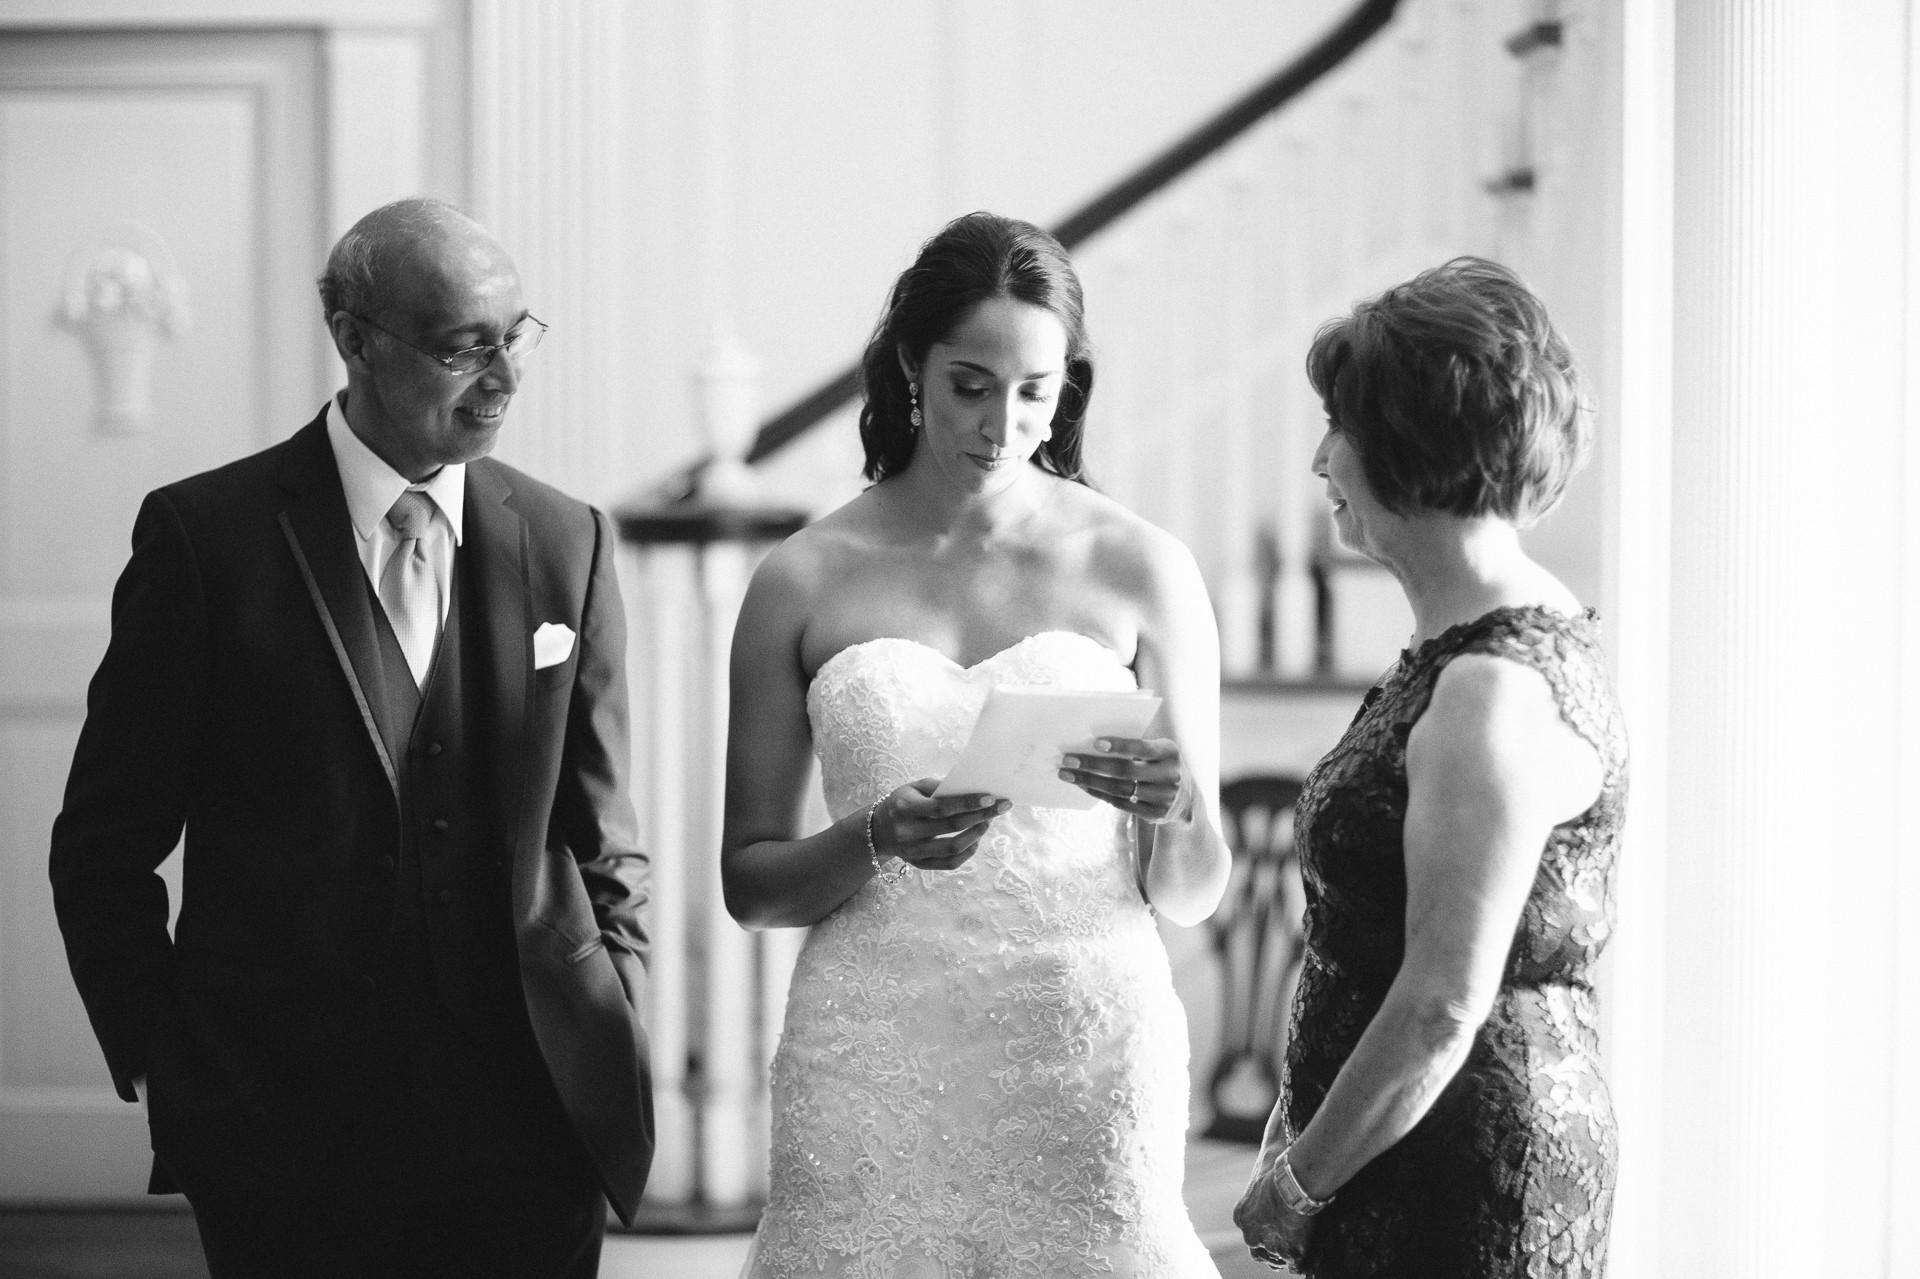 Bolton House Wedding Photographer in Beachwood 19.jpg